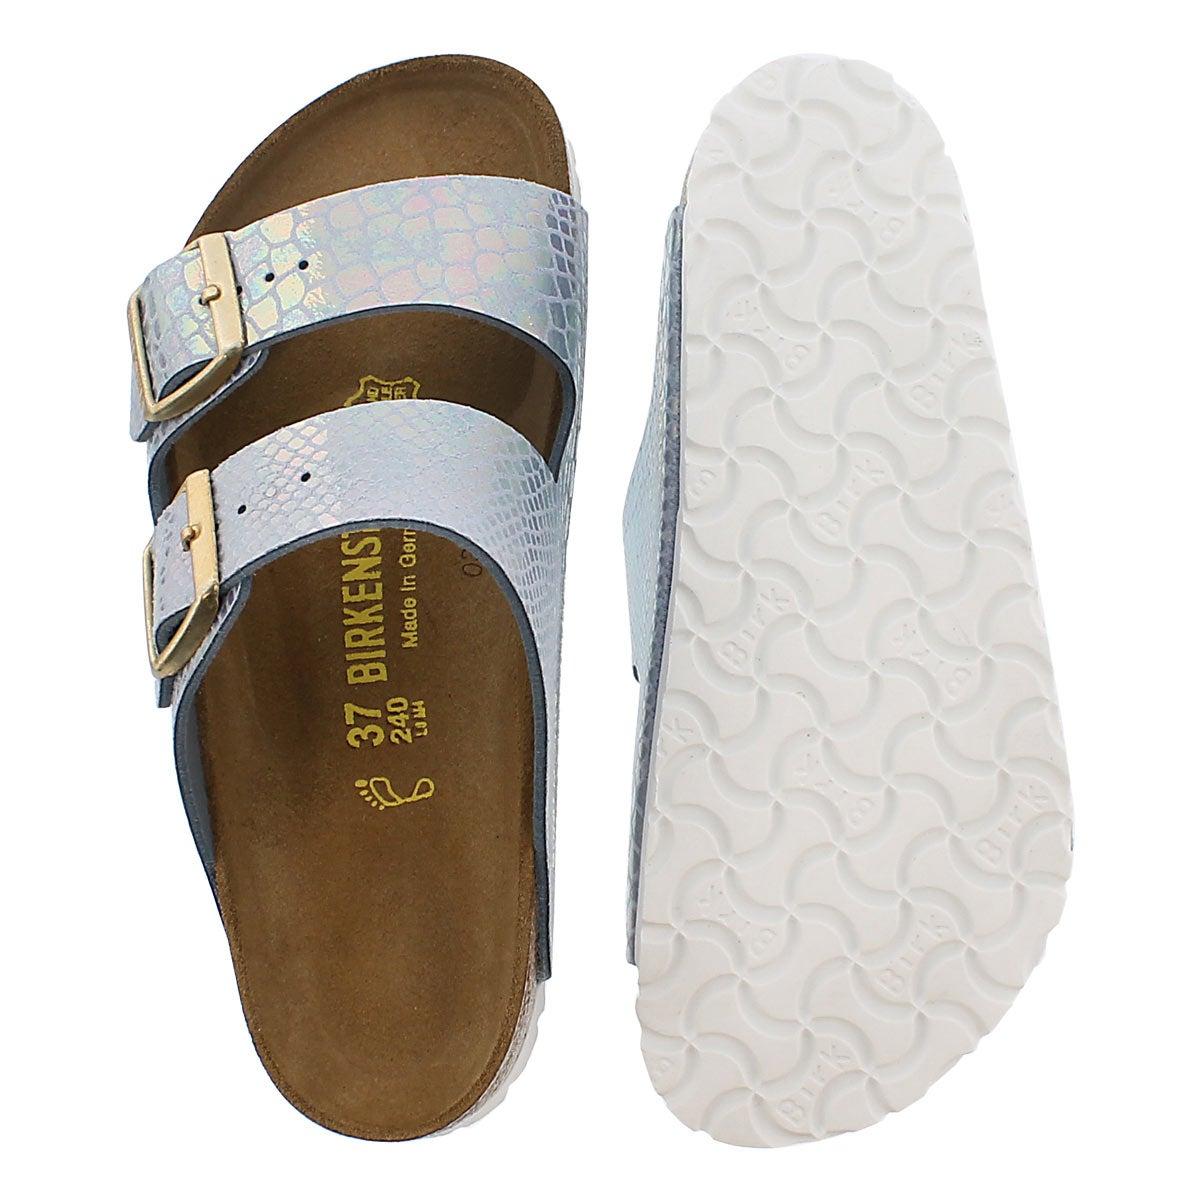 Sandale ARIZONA, serp bleu brill, fem